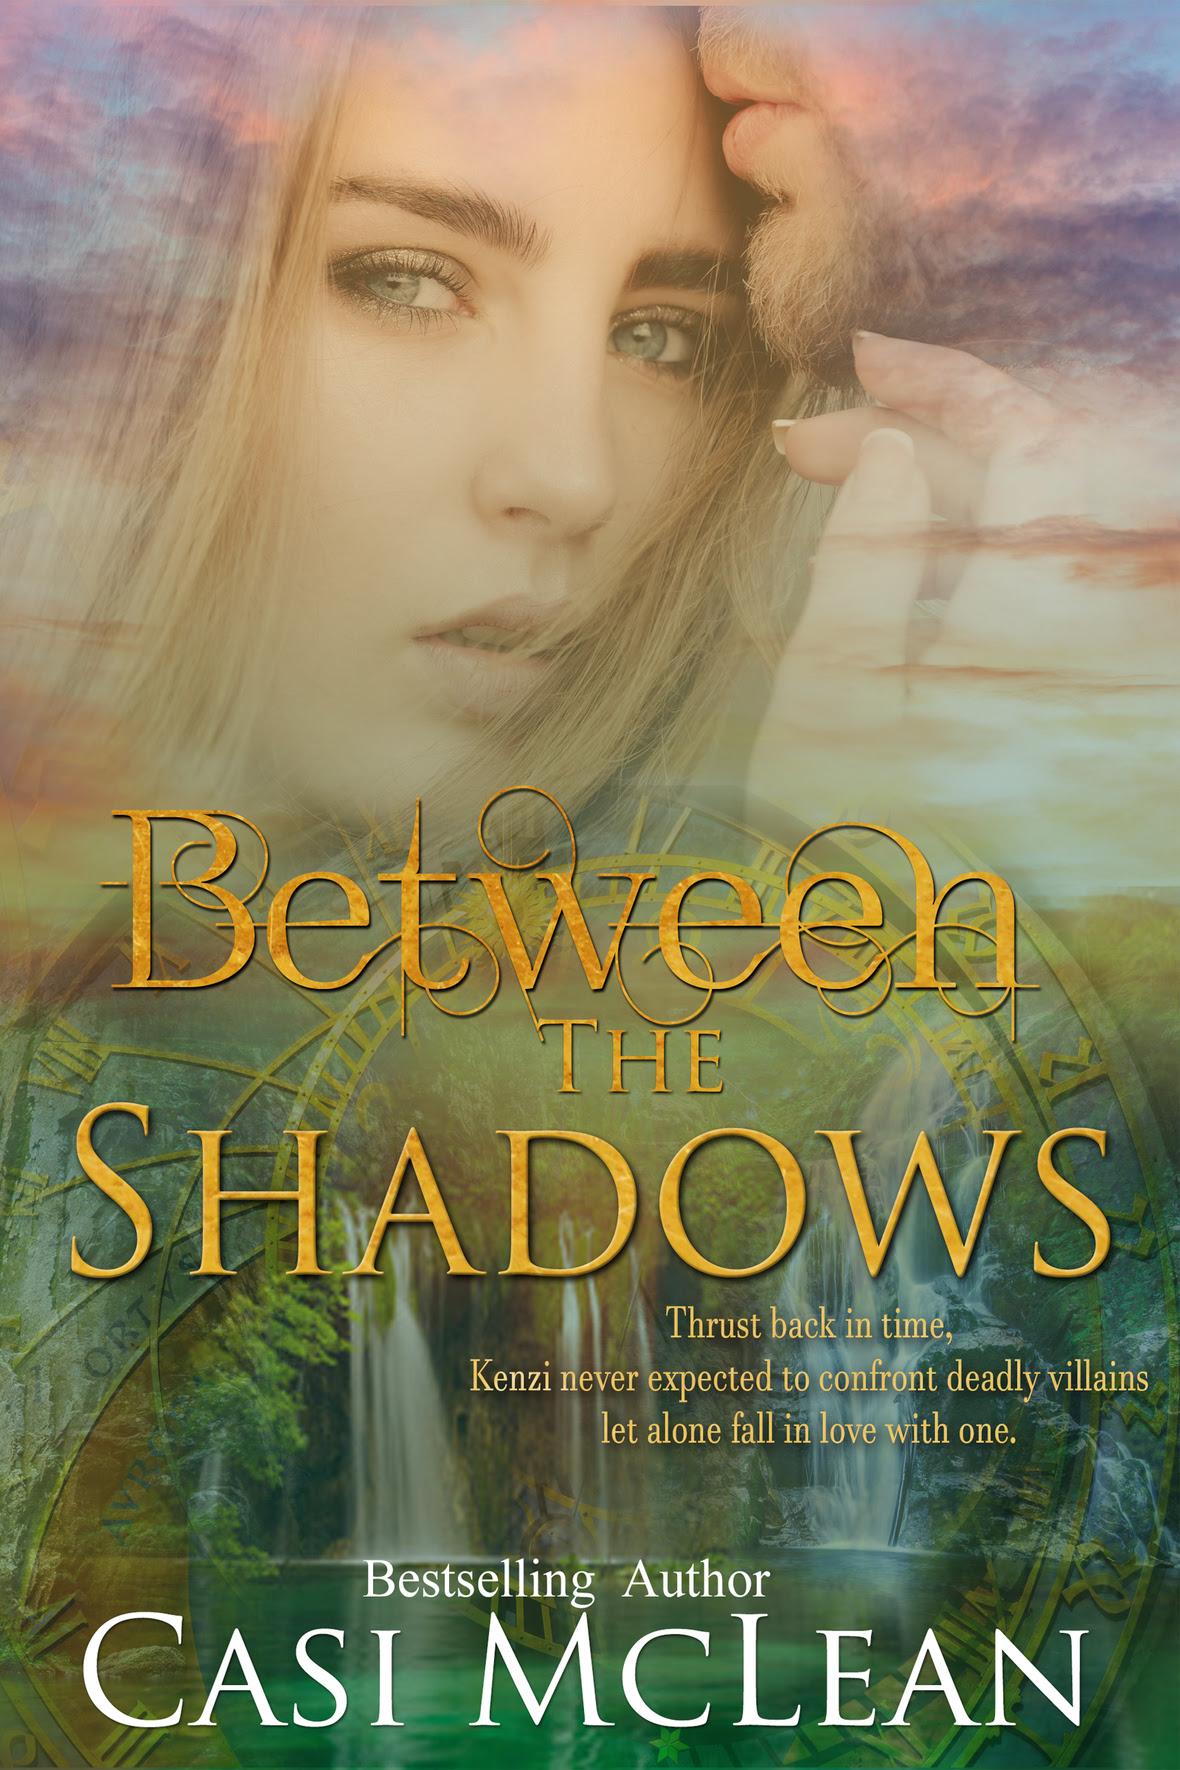 Between the shadows - kindle